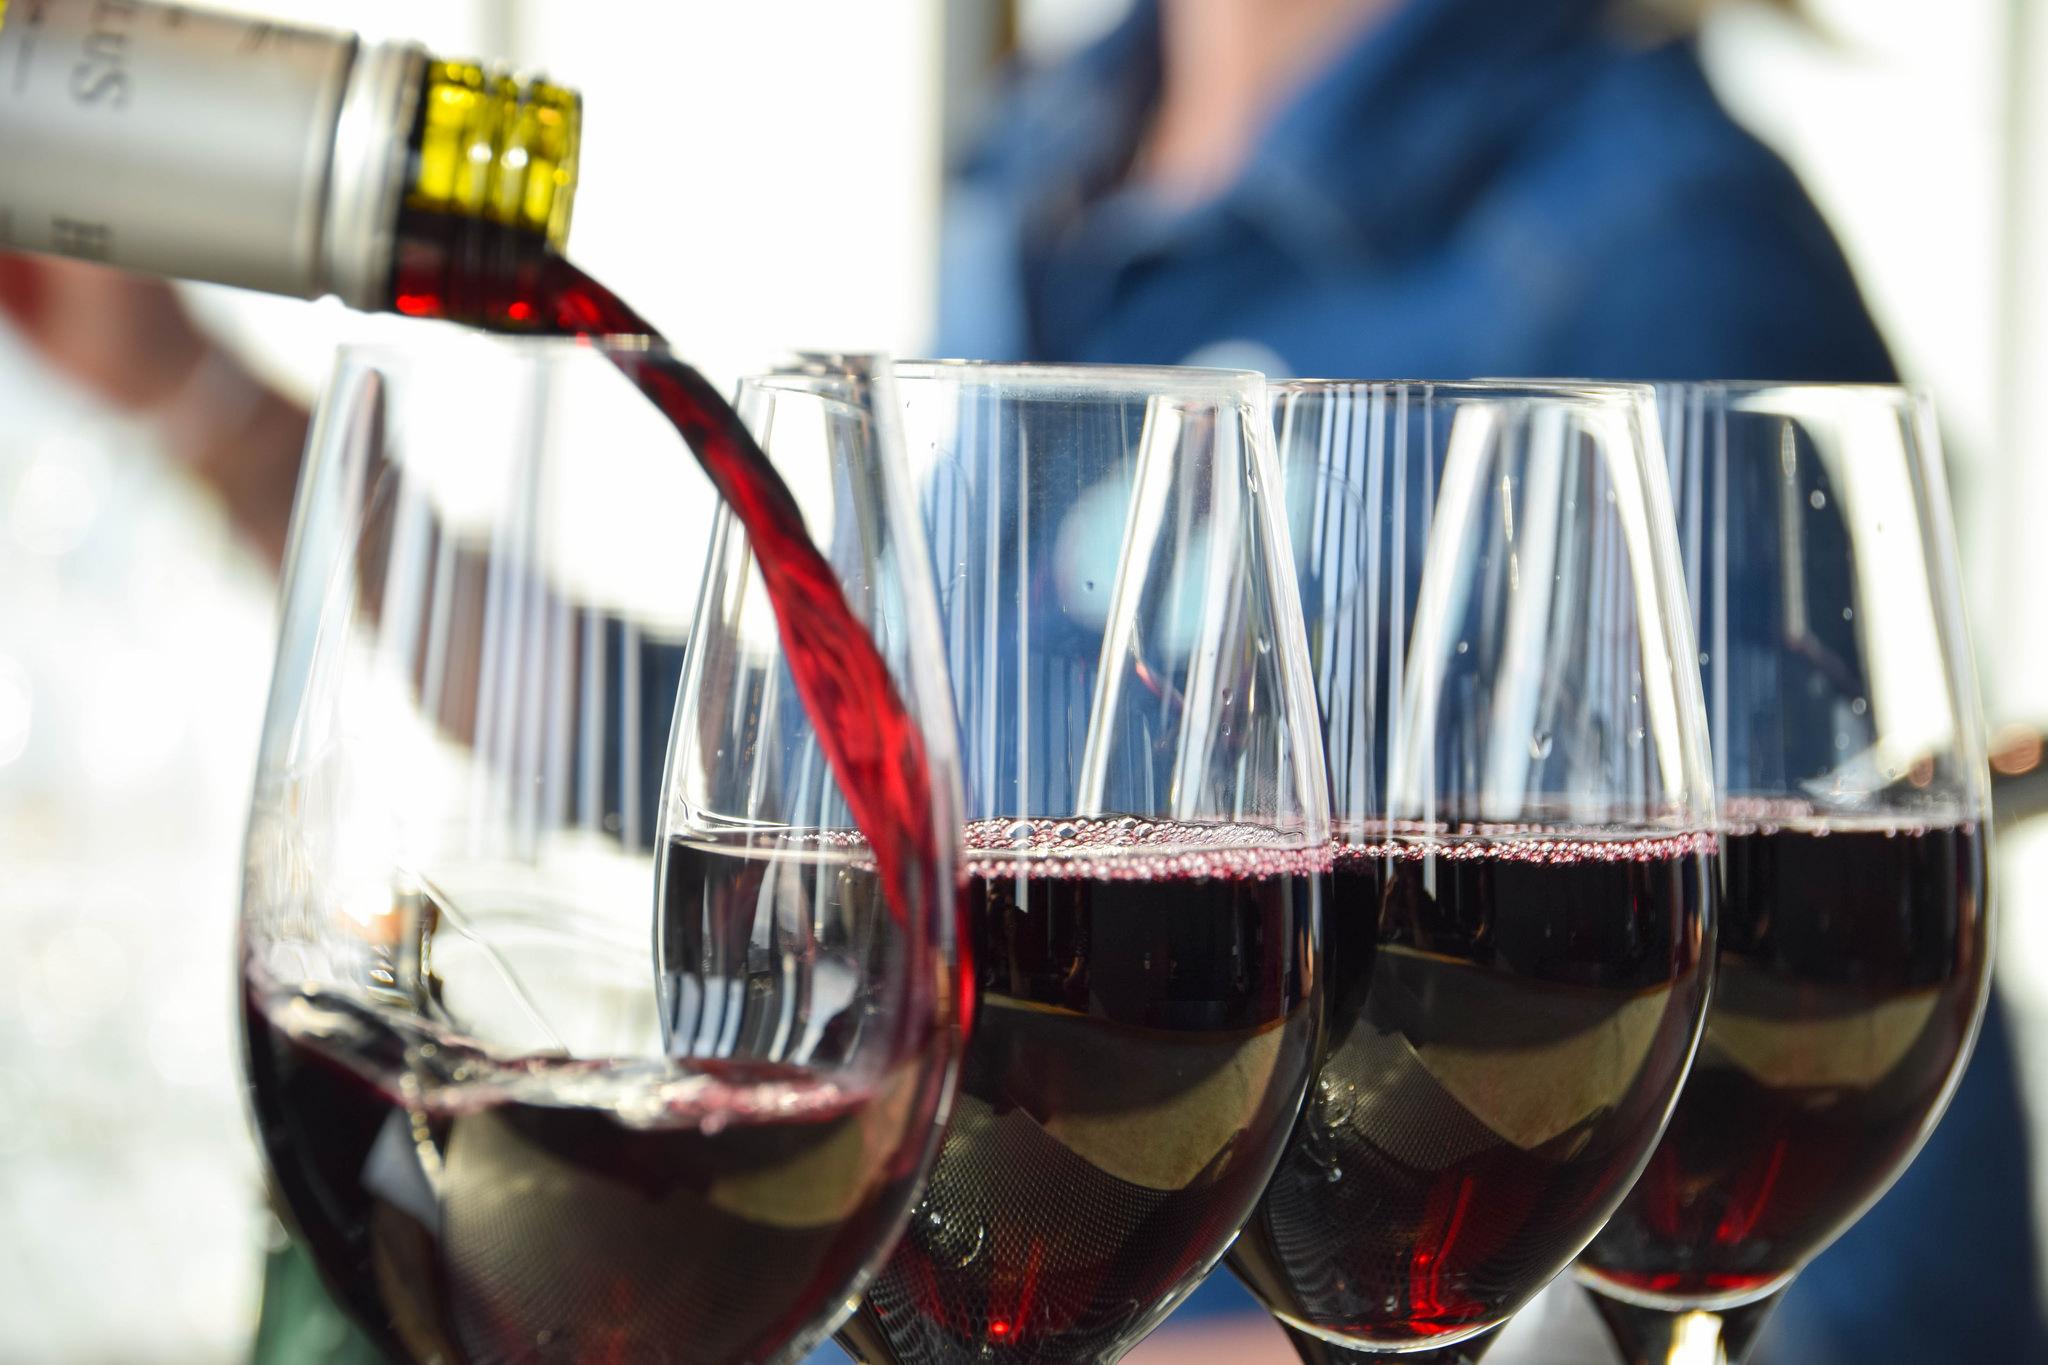 Wine being poured at a bar. (Credit: Maria Eklind/ Flickr)